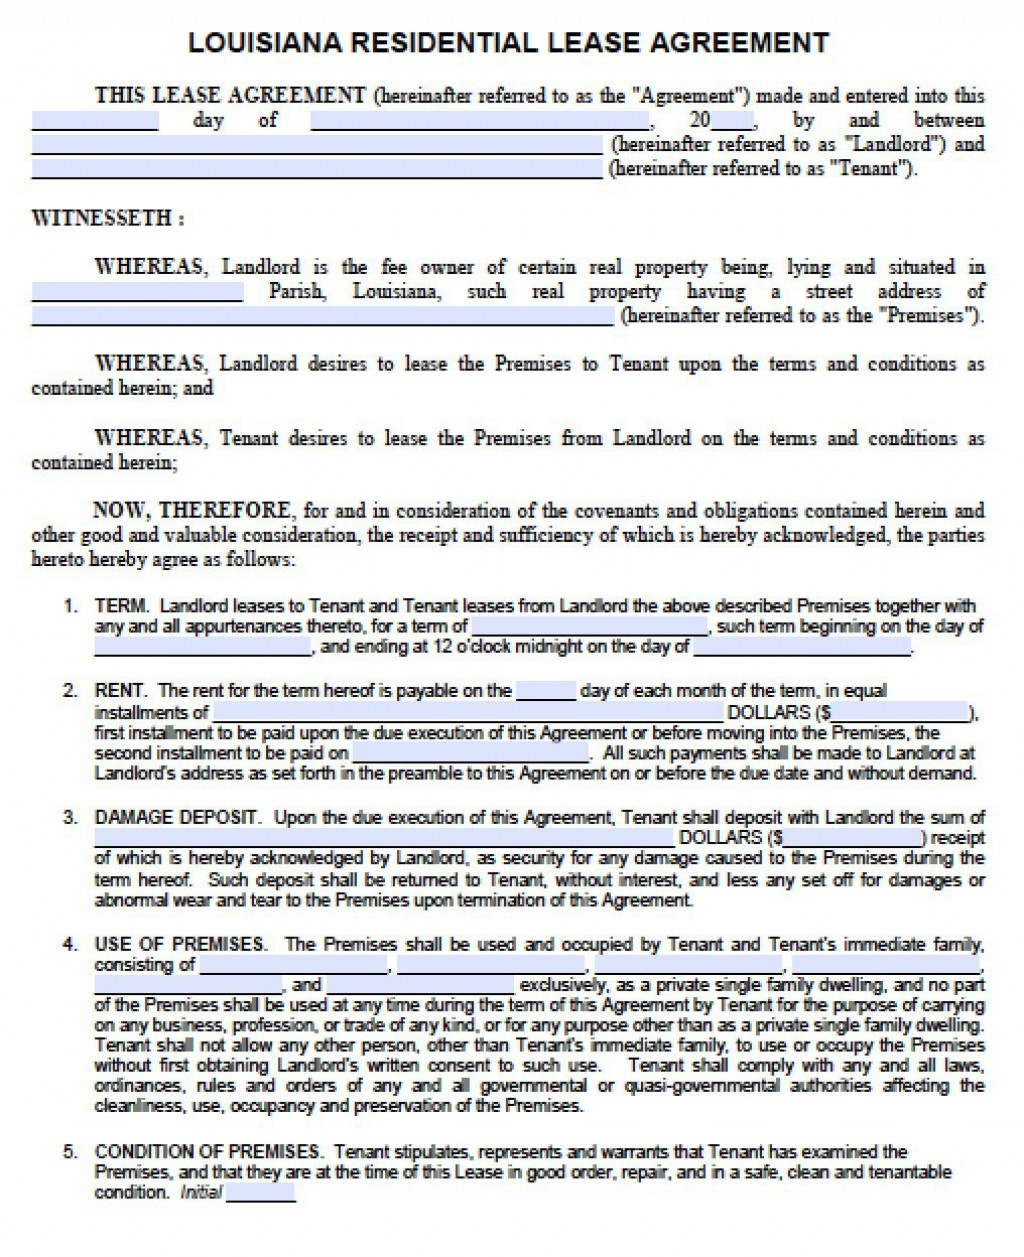 005 Shocking Rent Lease Template Free High Resolution  Room Rental Agreement Form Residential Pdf DownloadLarge